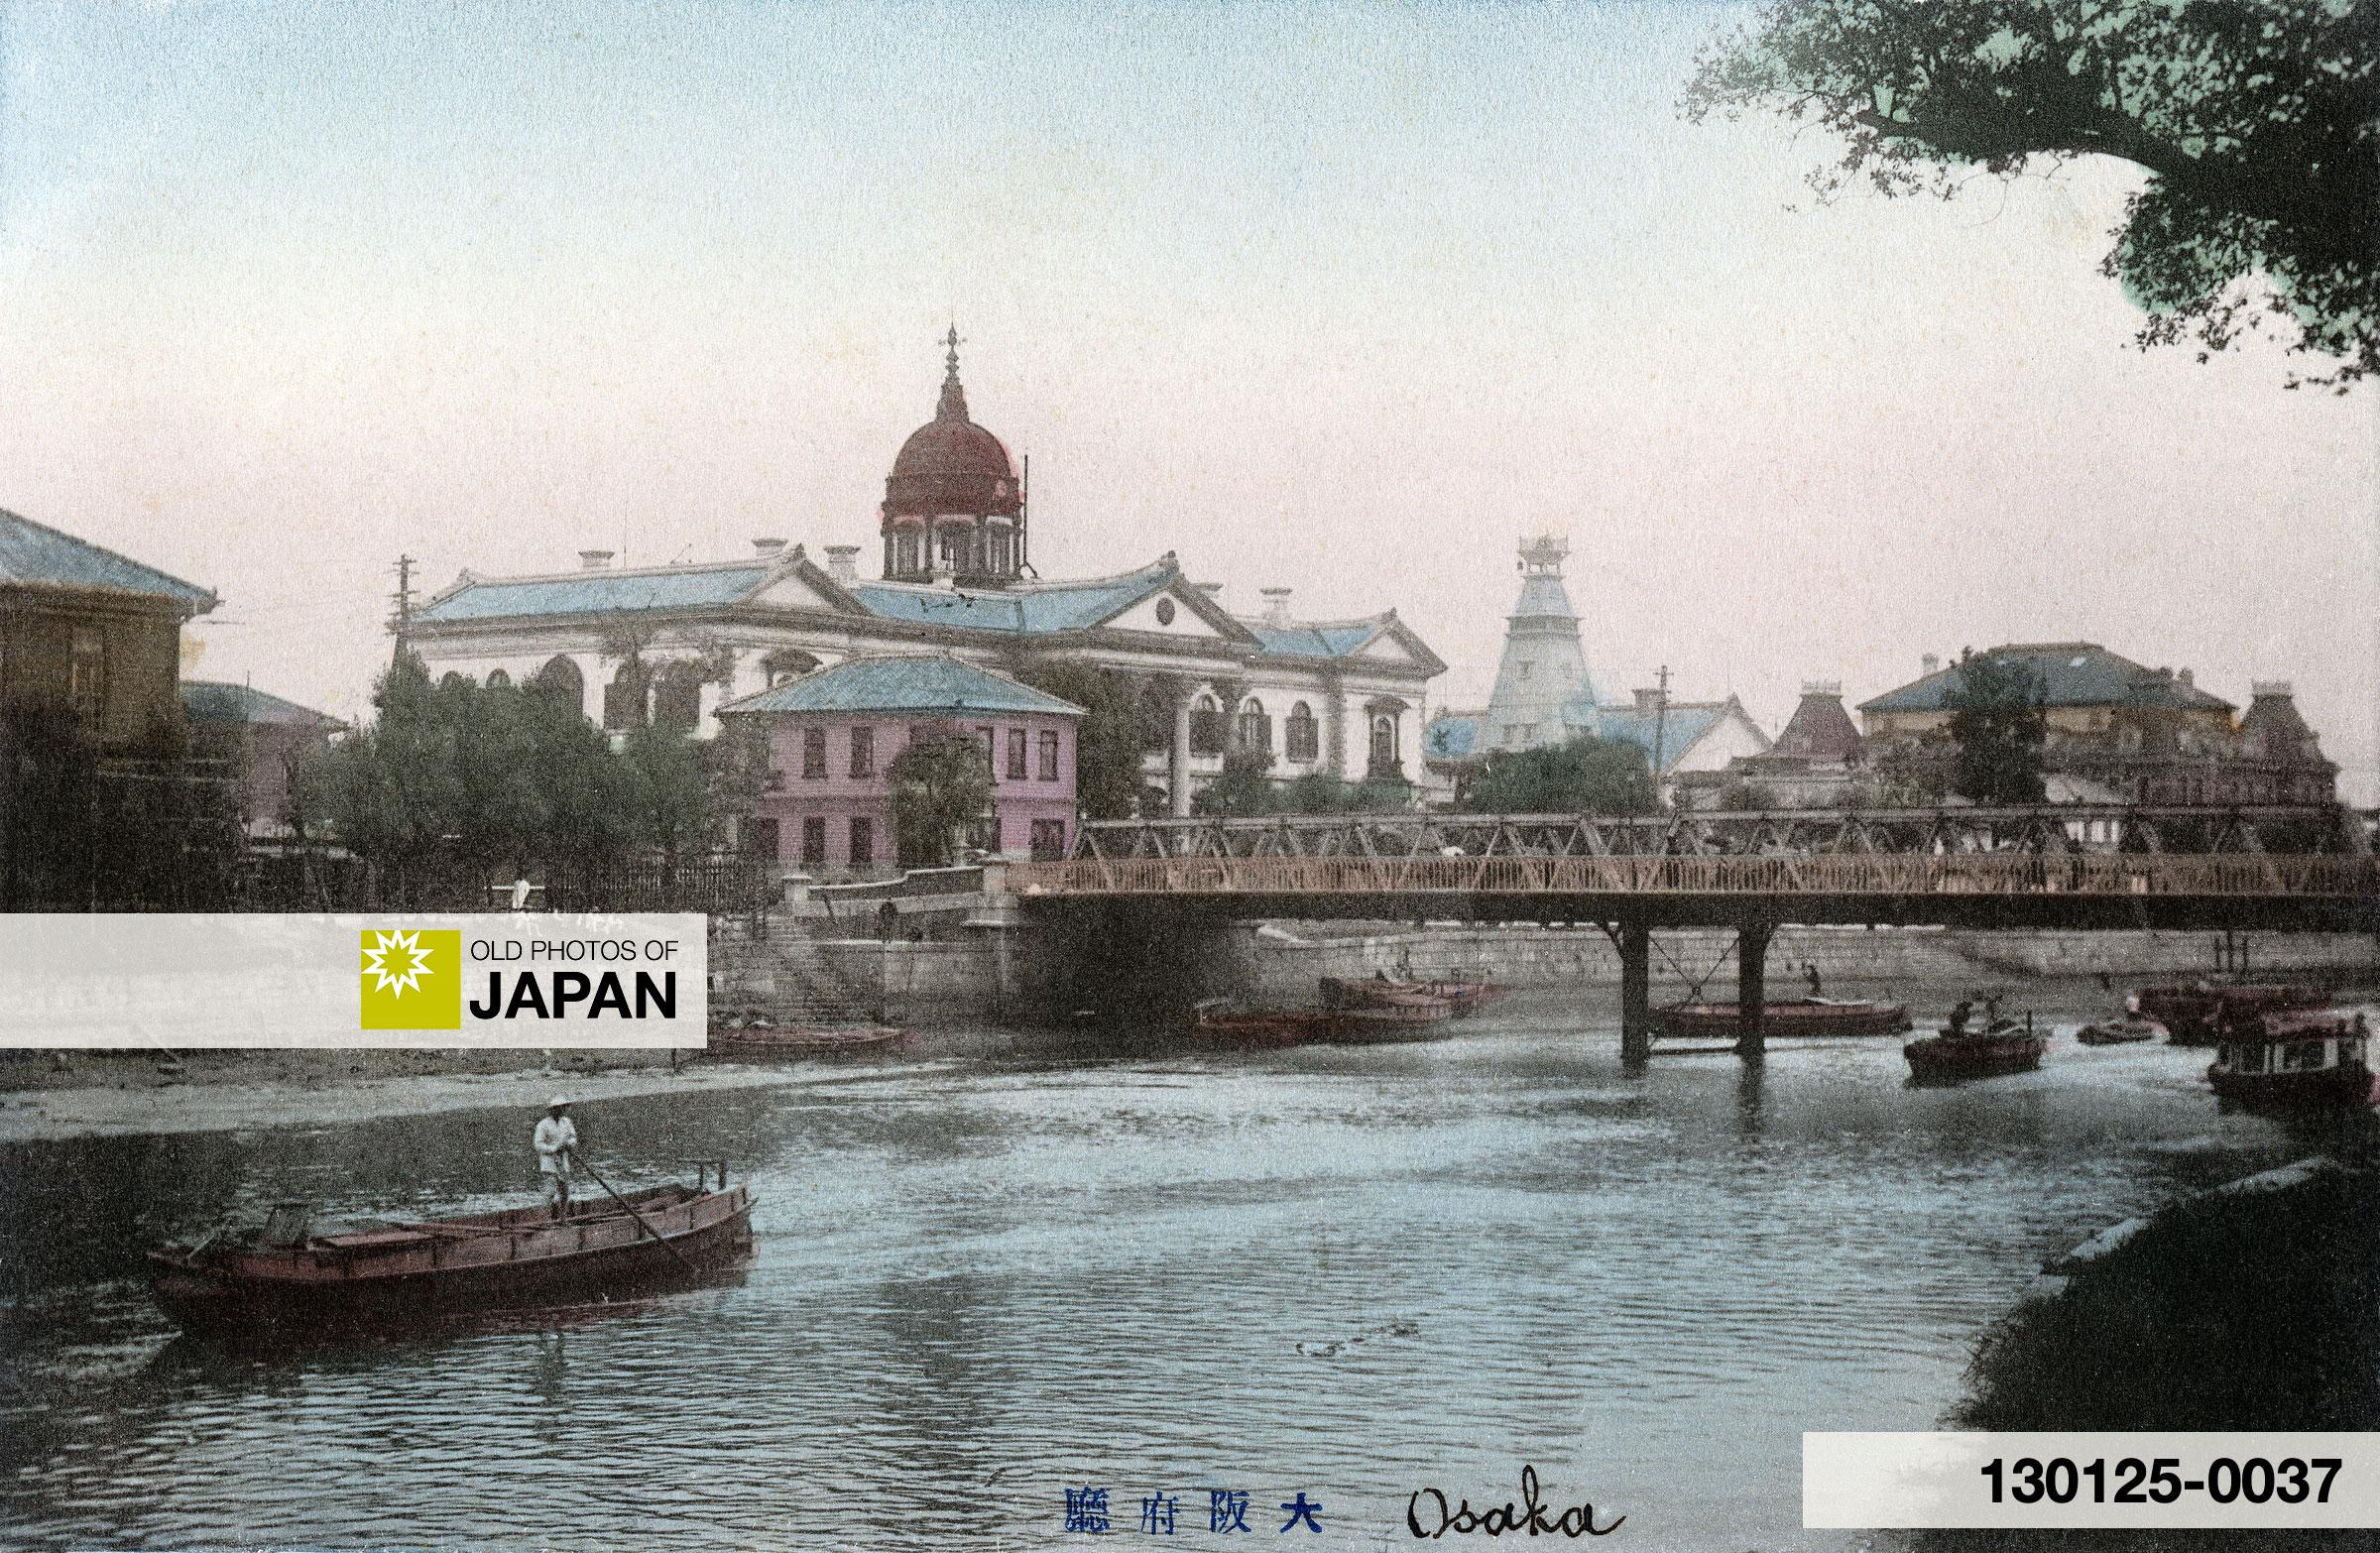 130125-0037 - Osaka Prefectural Office on Enokojima